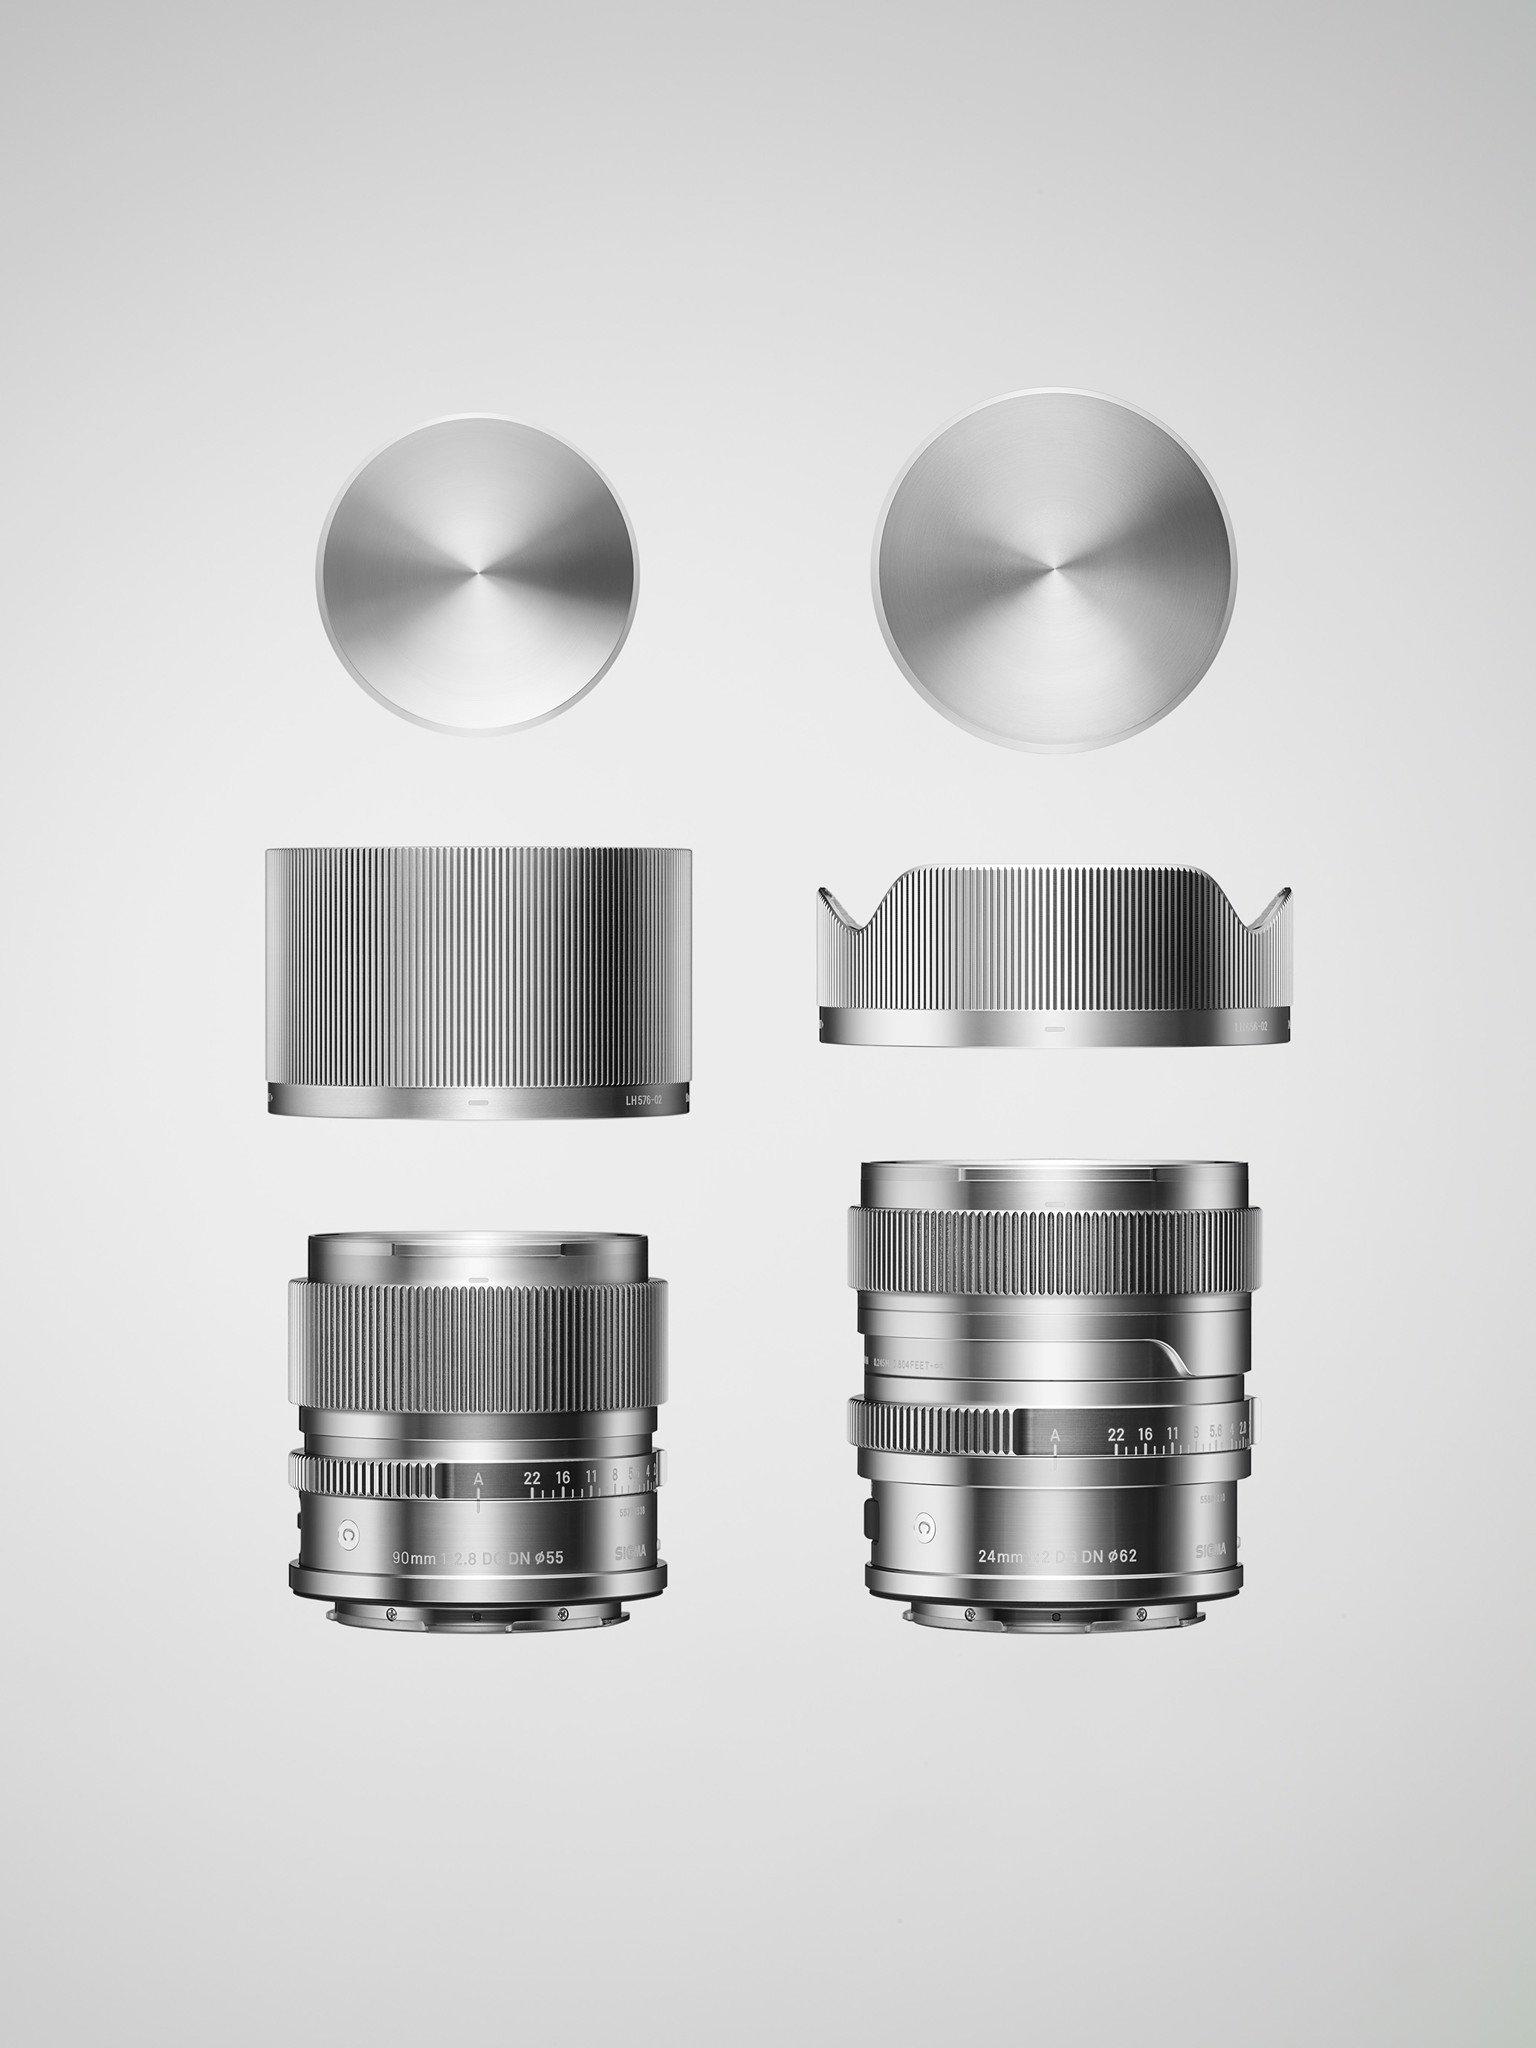 Sigma 90mm F2.8 DG DN (C) I series